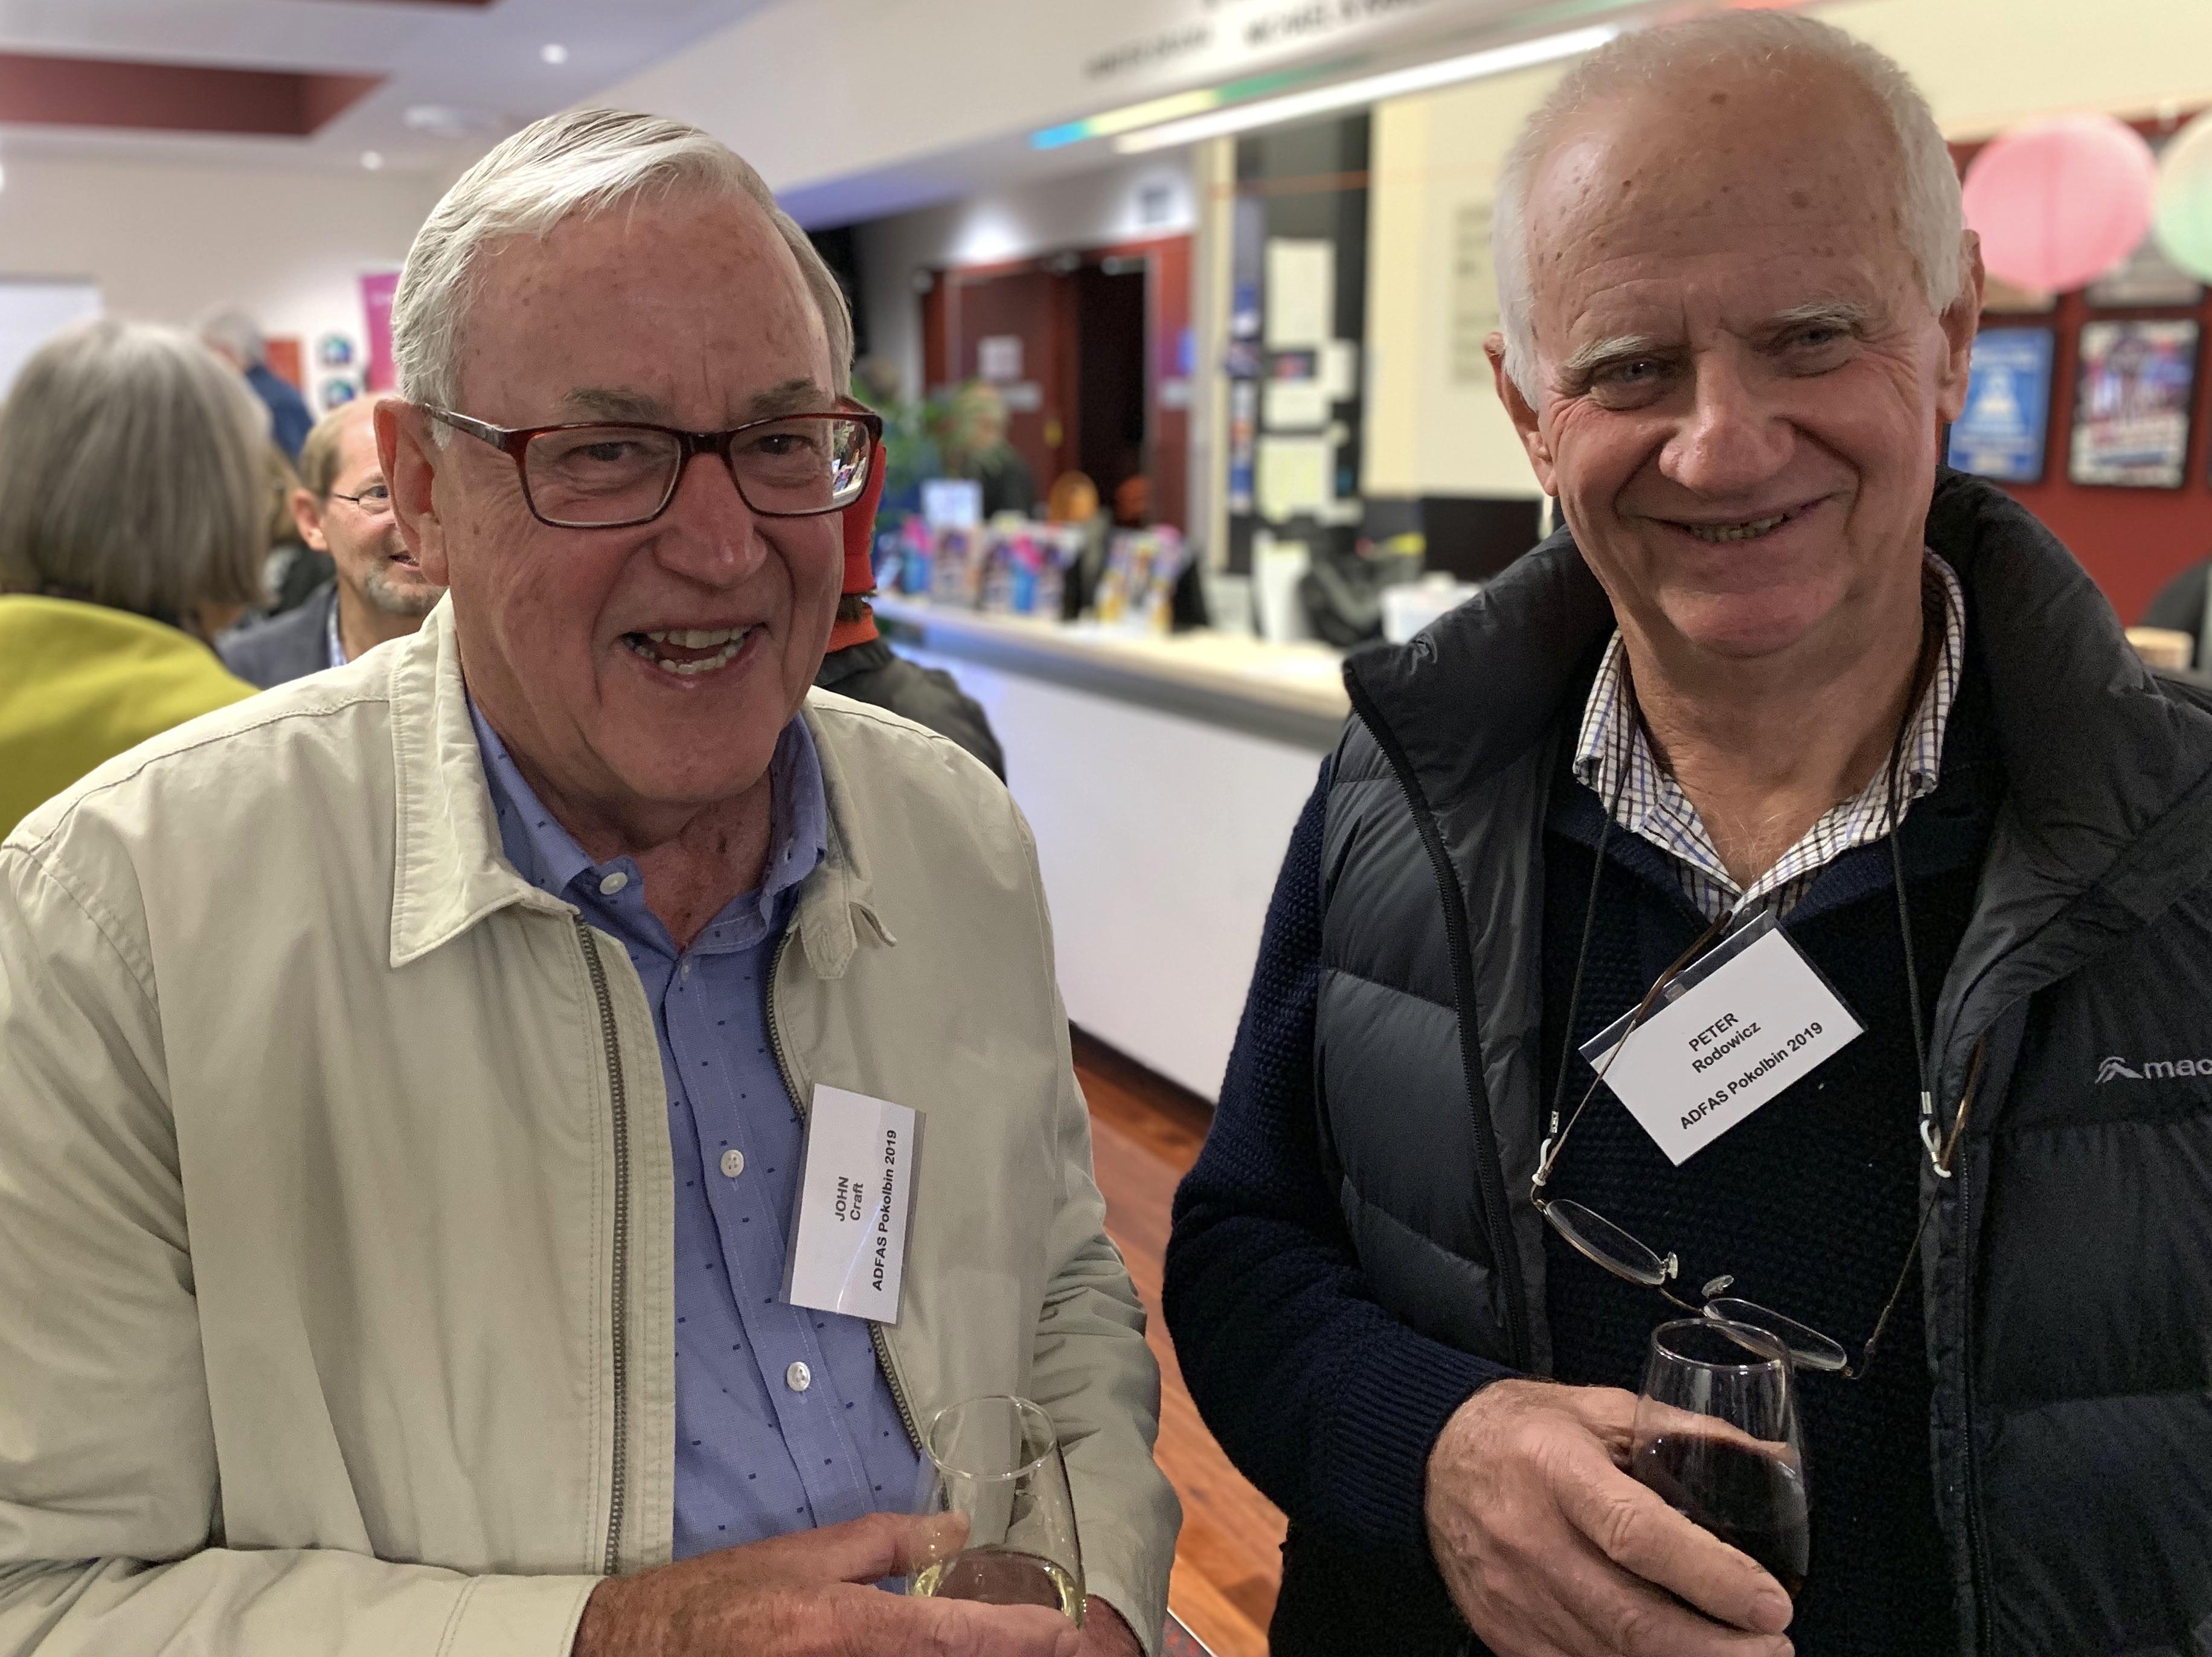 John Craft & Peter Rodowicz